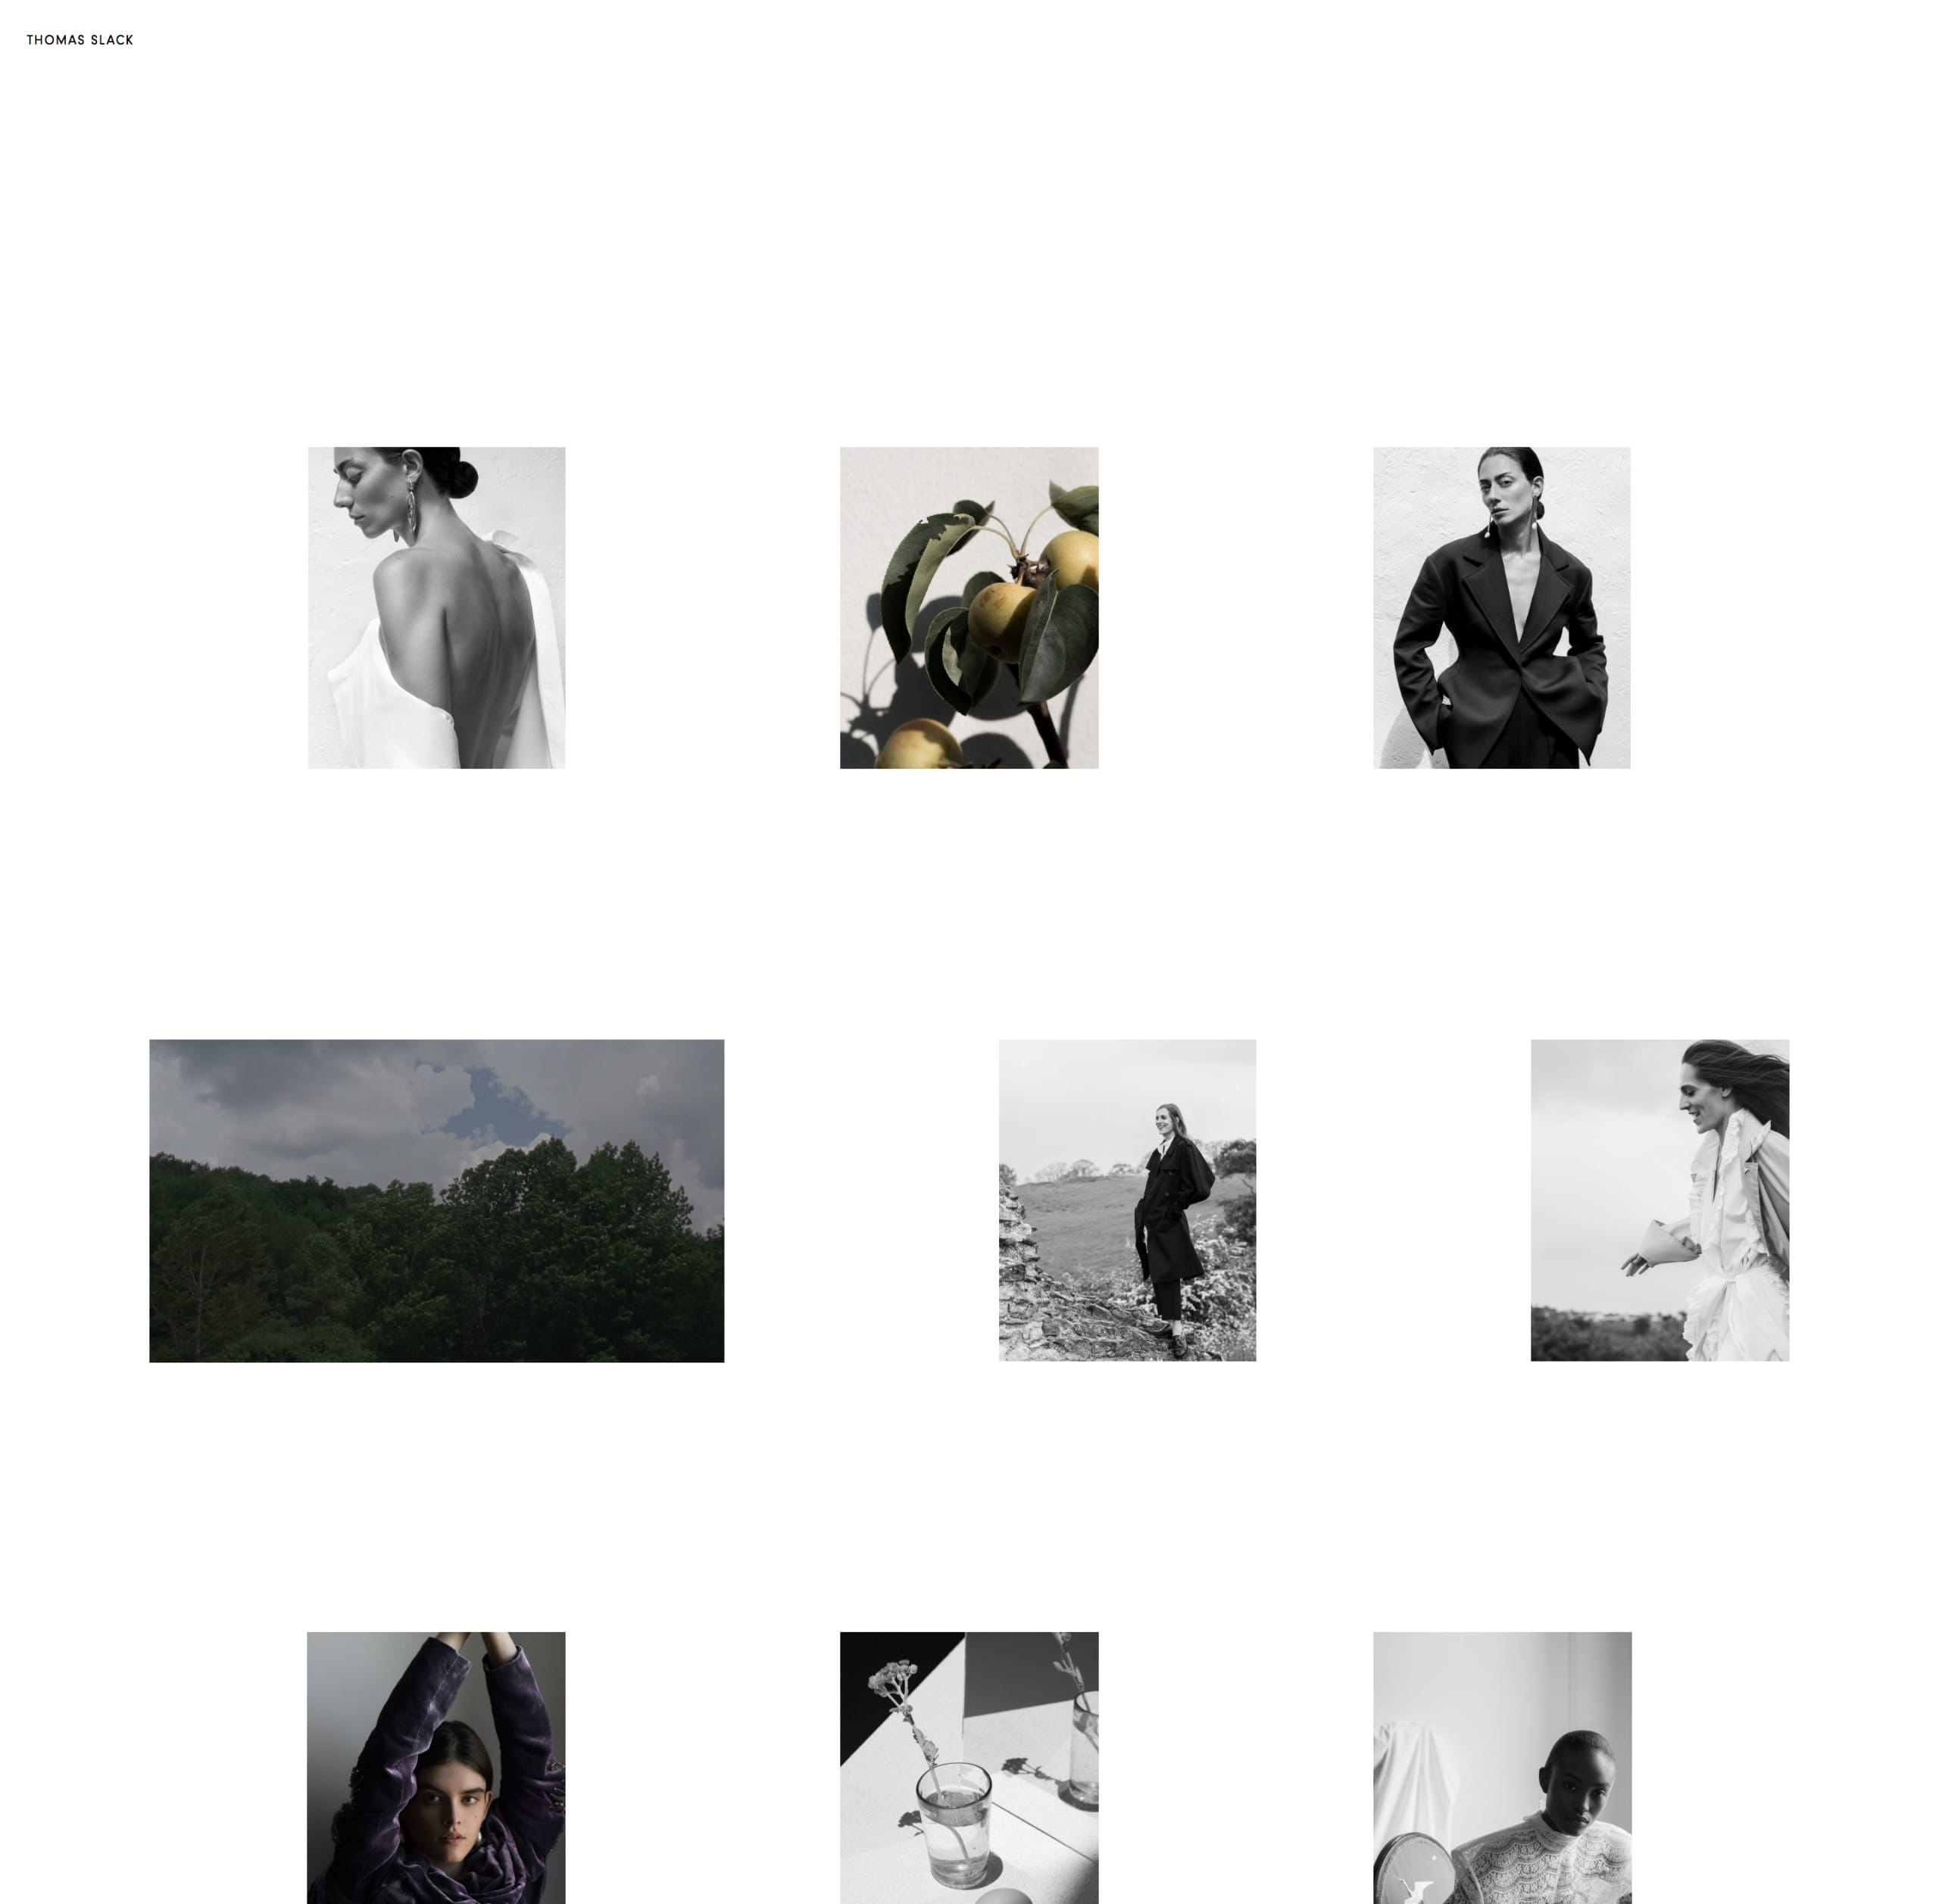 Thomas Slack Website Screenshot